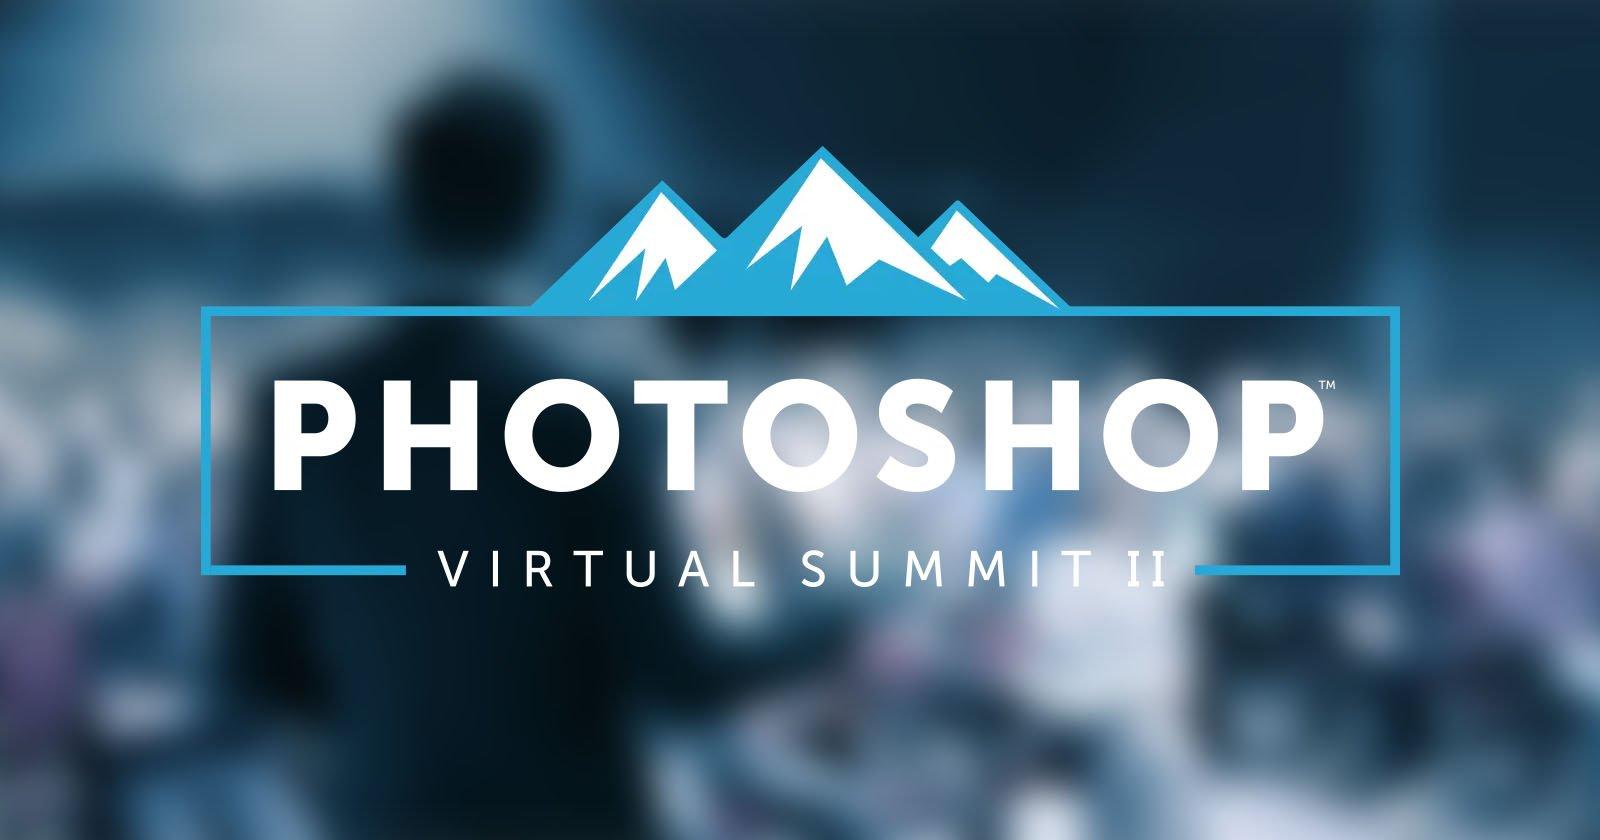 Photoshop Virtual Summit II: 5 Days of Free Photoshop Training by Top Pros